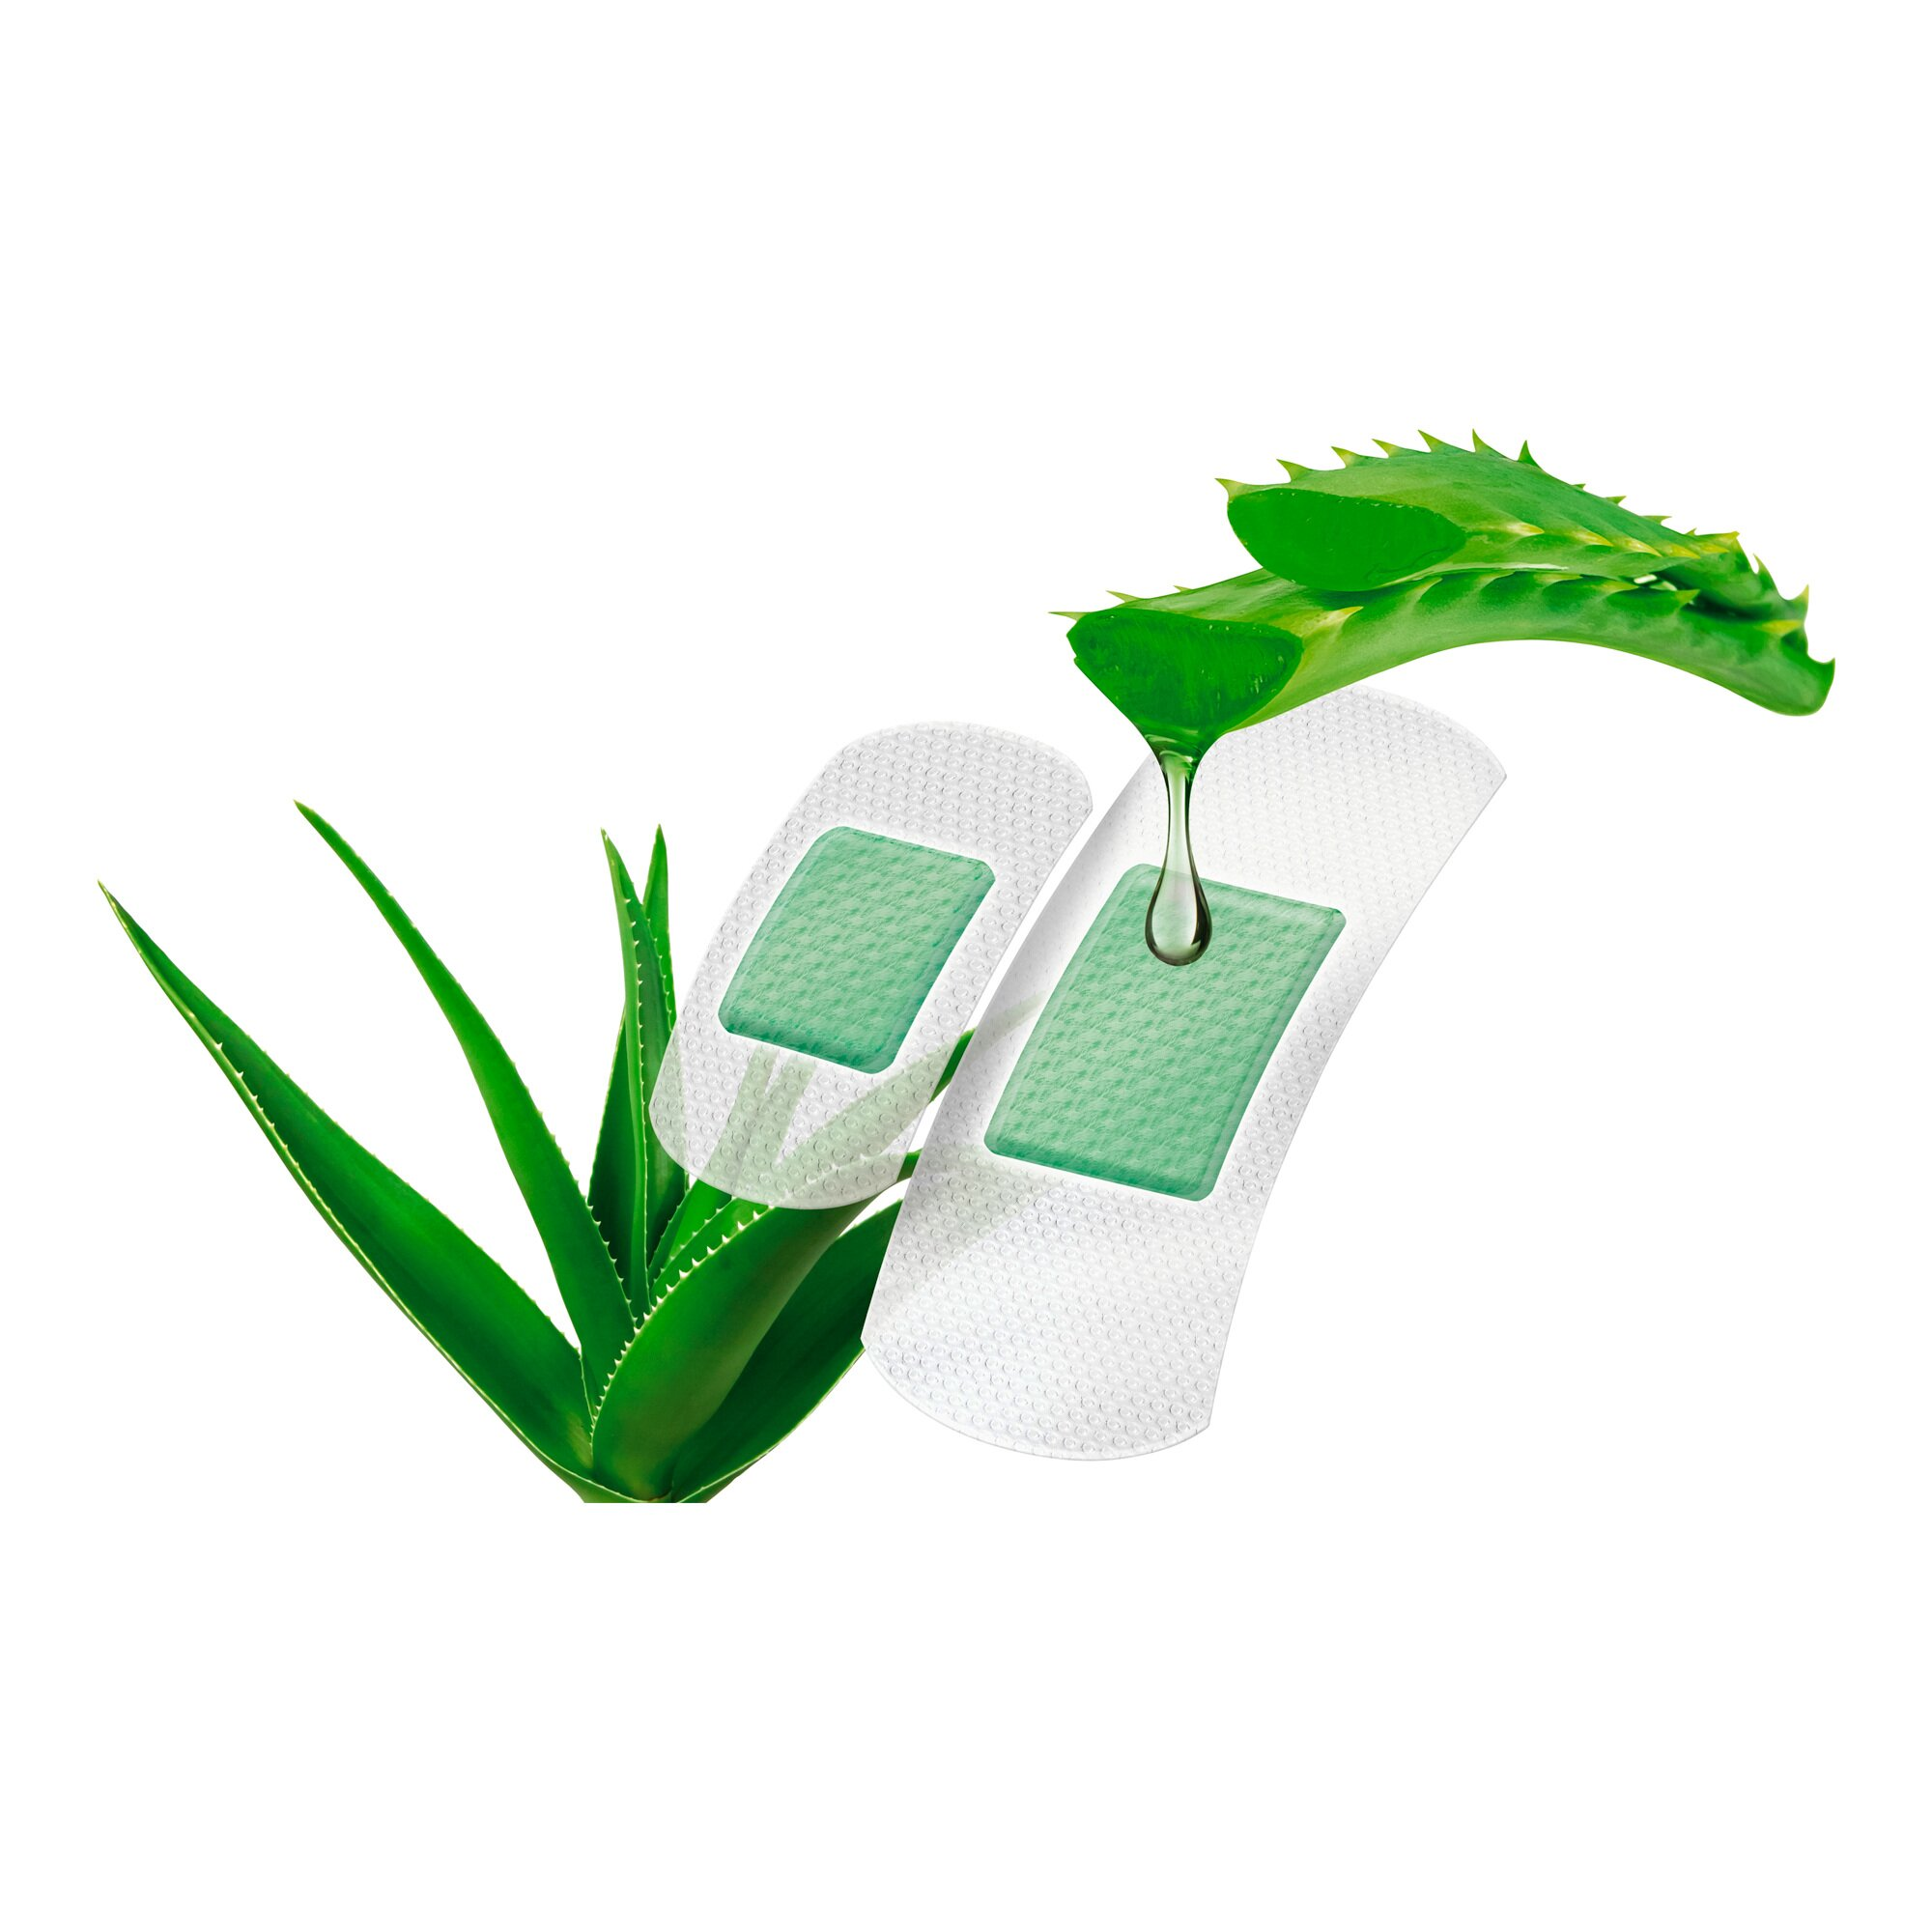 Image of 10 Pflaster mit Aloe Vera